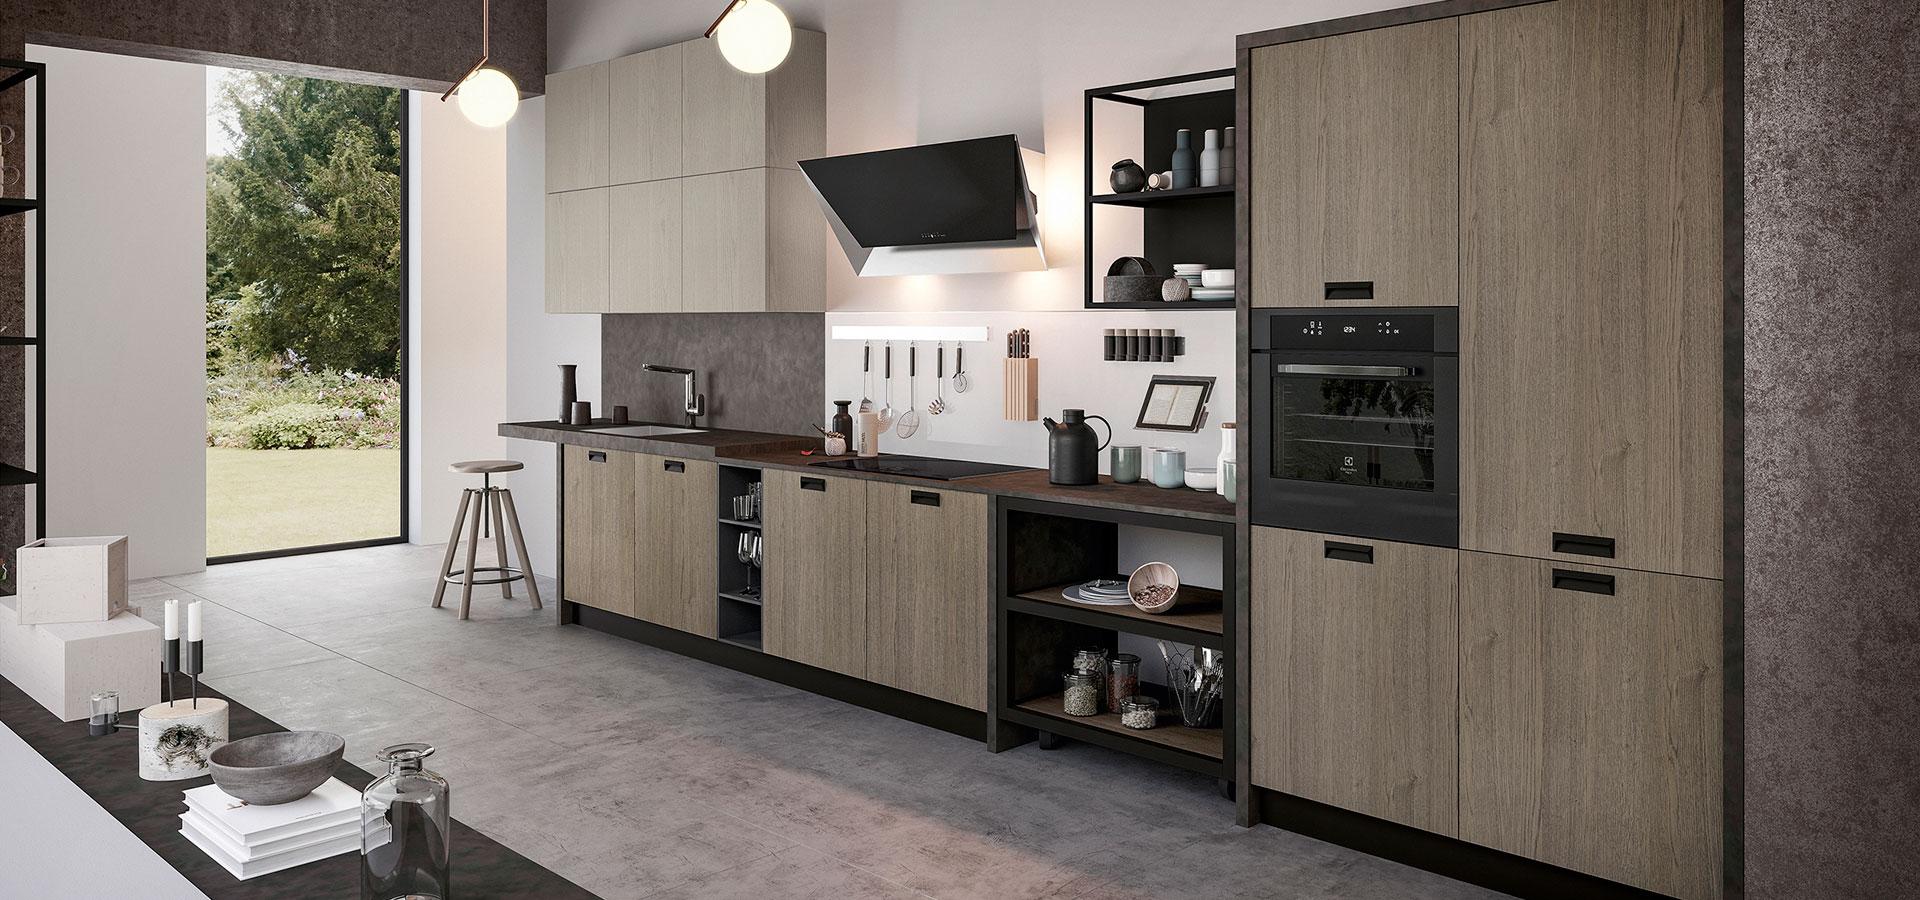 Best Arredo3 Cucine Opinioni Images - Home Design - joygree.info